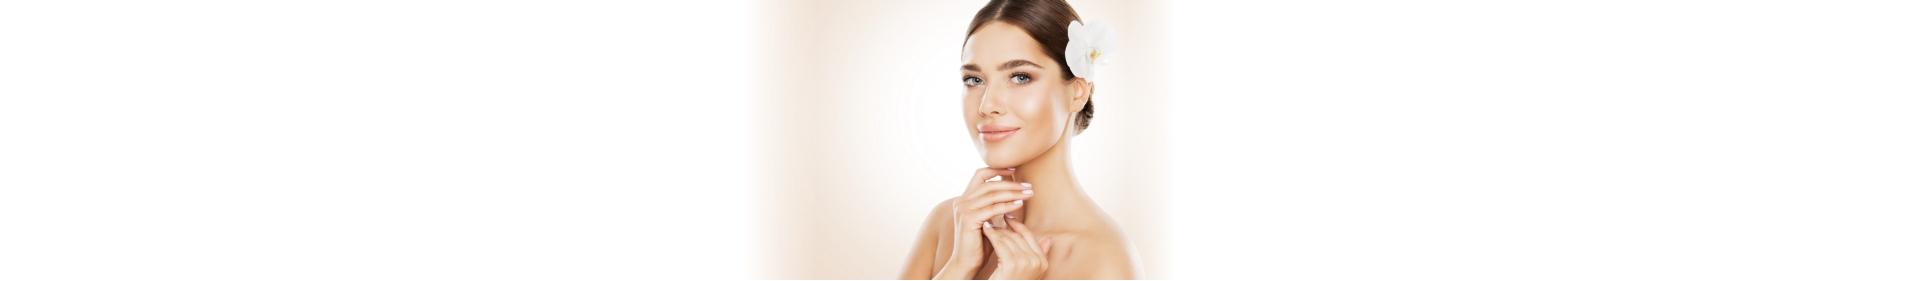 Woman Beauty, Face Skin Care